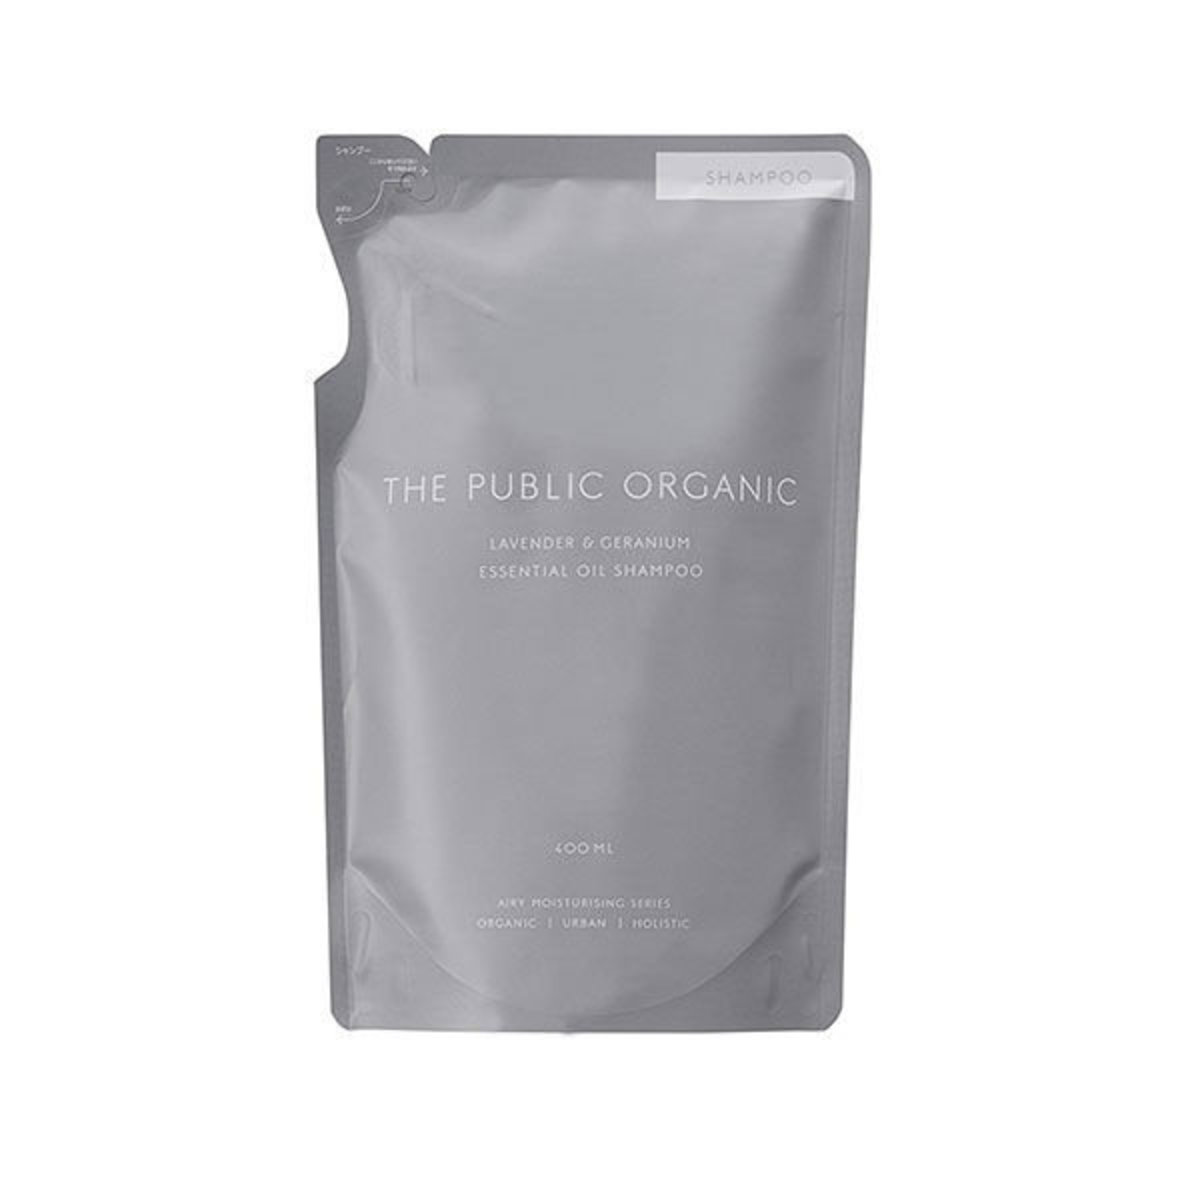 Lavender & Geranium Essential Oil Shampoo (Super Relax)(Refill) 400ml (Parallel Imports Product)